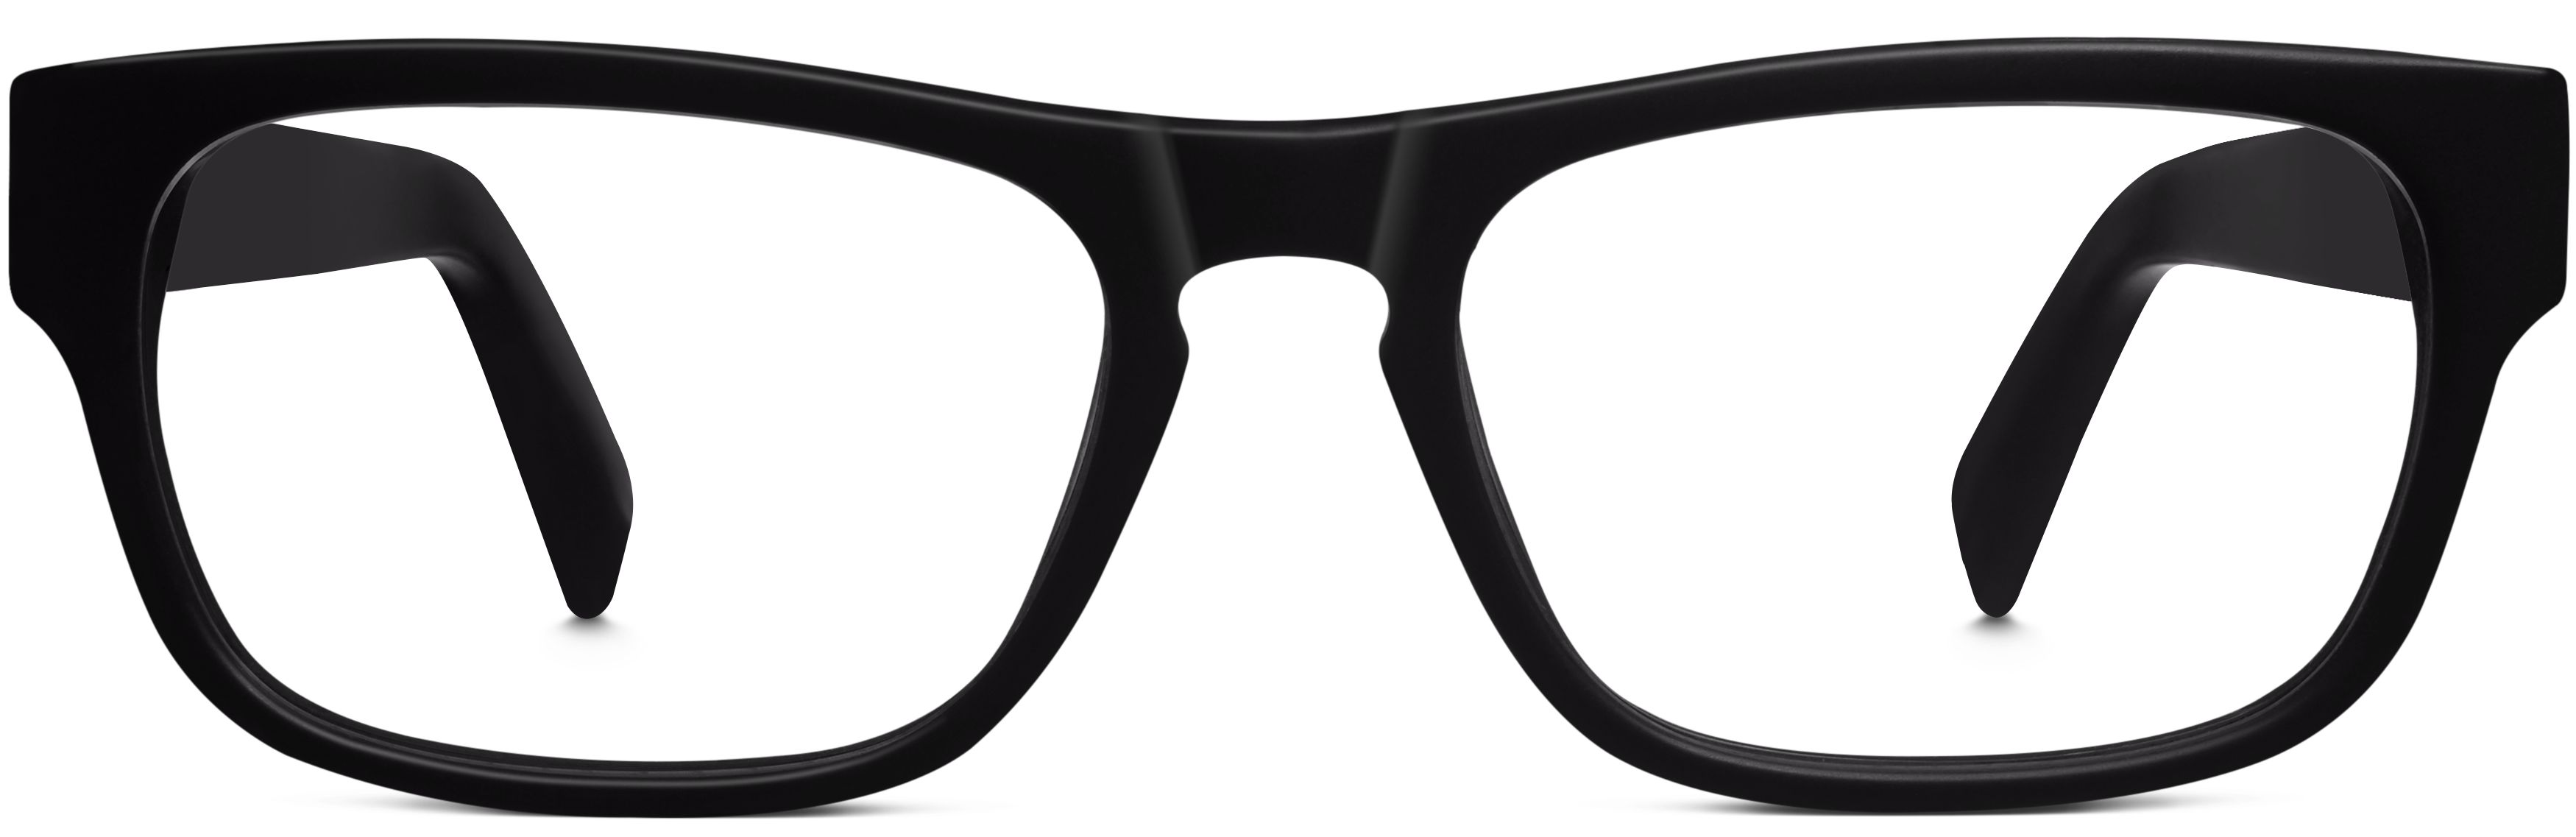 cfa2076b4d8 Roosevelt Eyeglasses in Jet Black Matte for Men